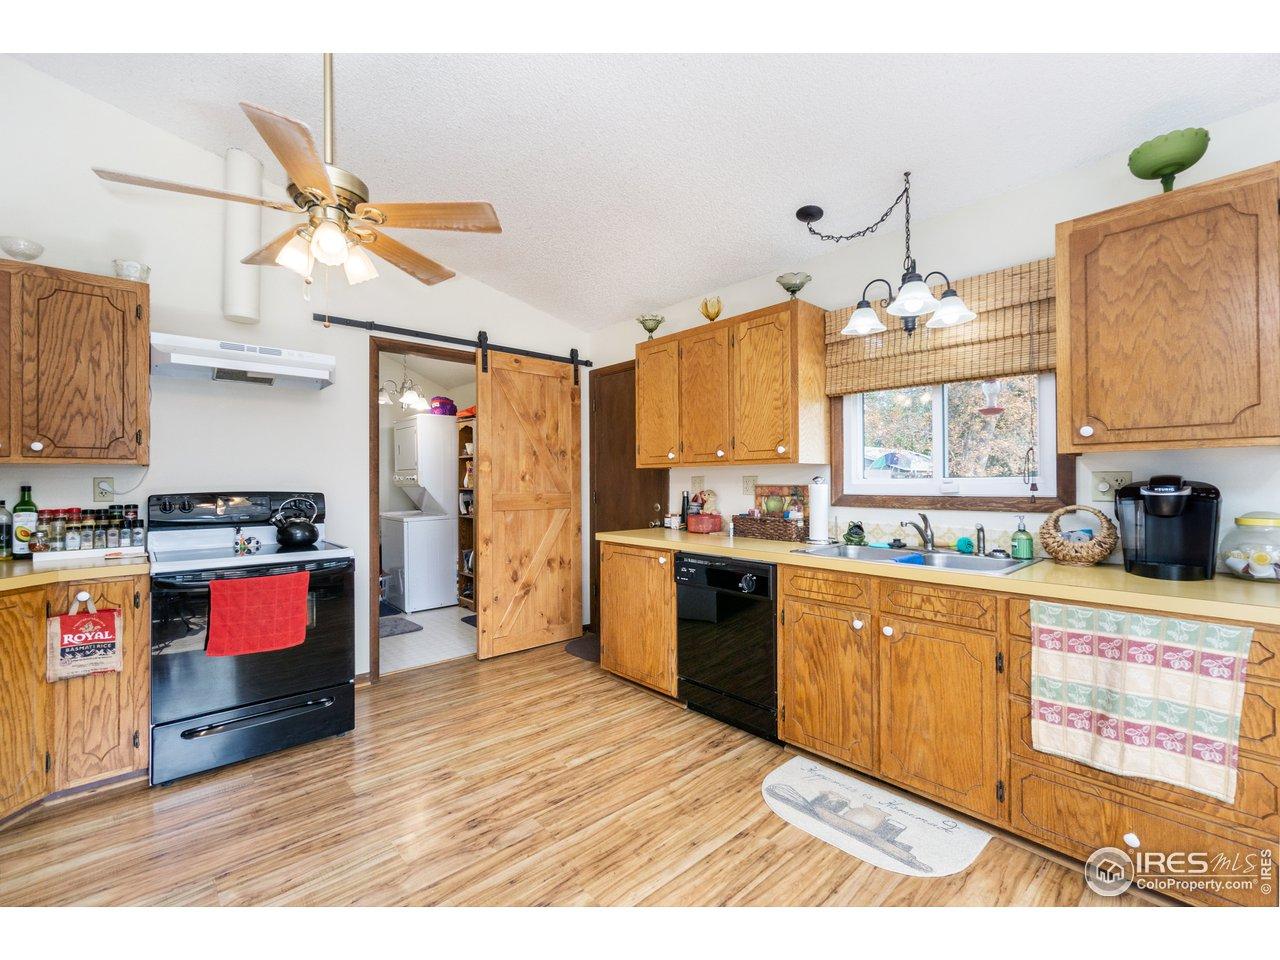 Kitchen with barn door to 1/2 bath